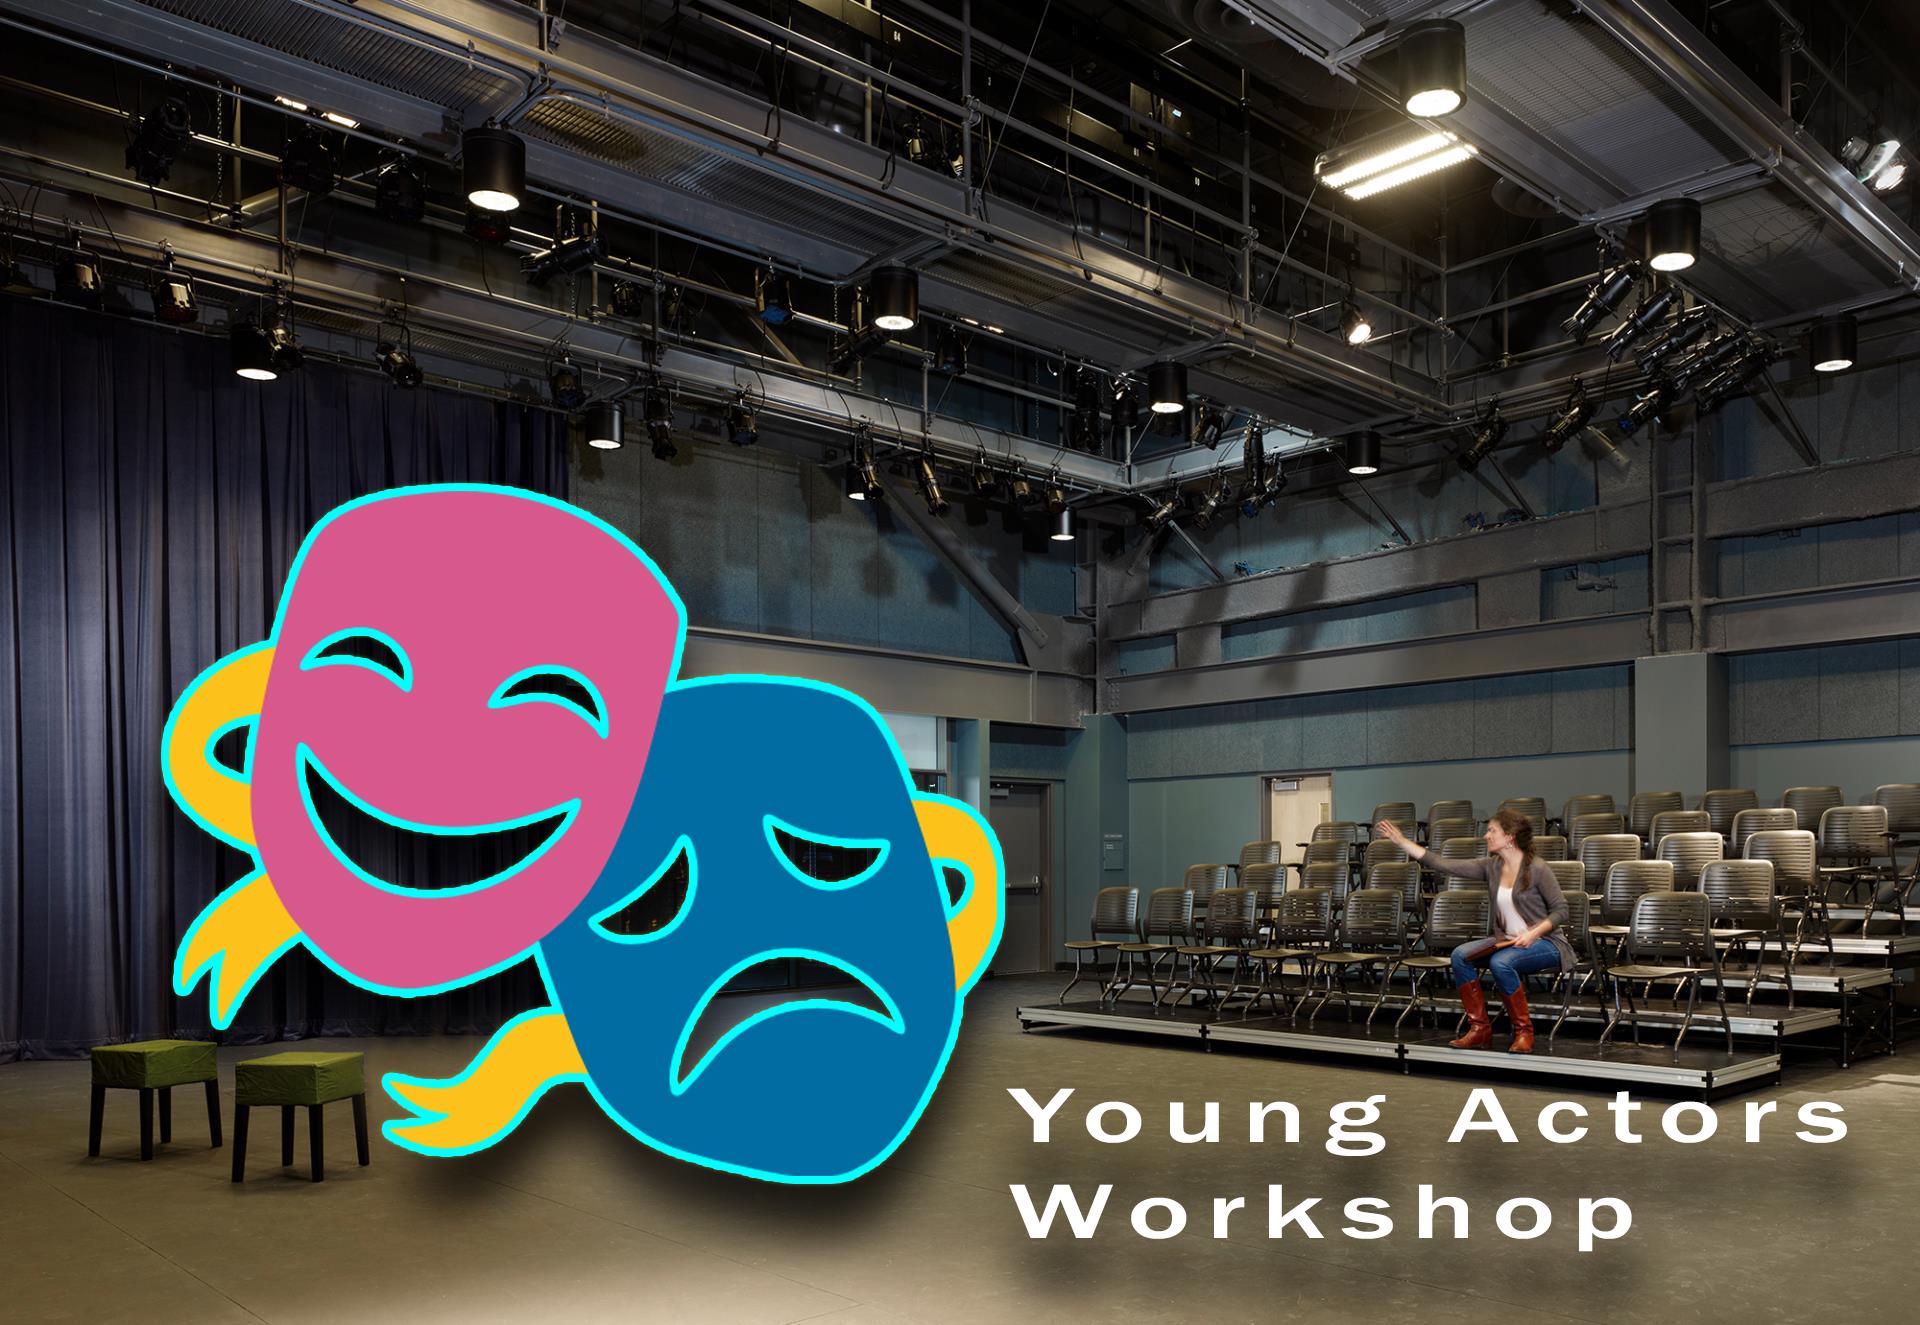 Young Actors Workshop photo